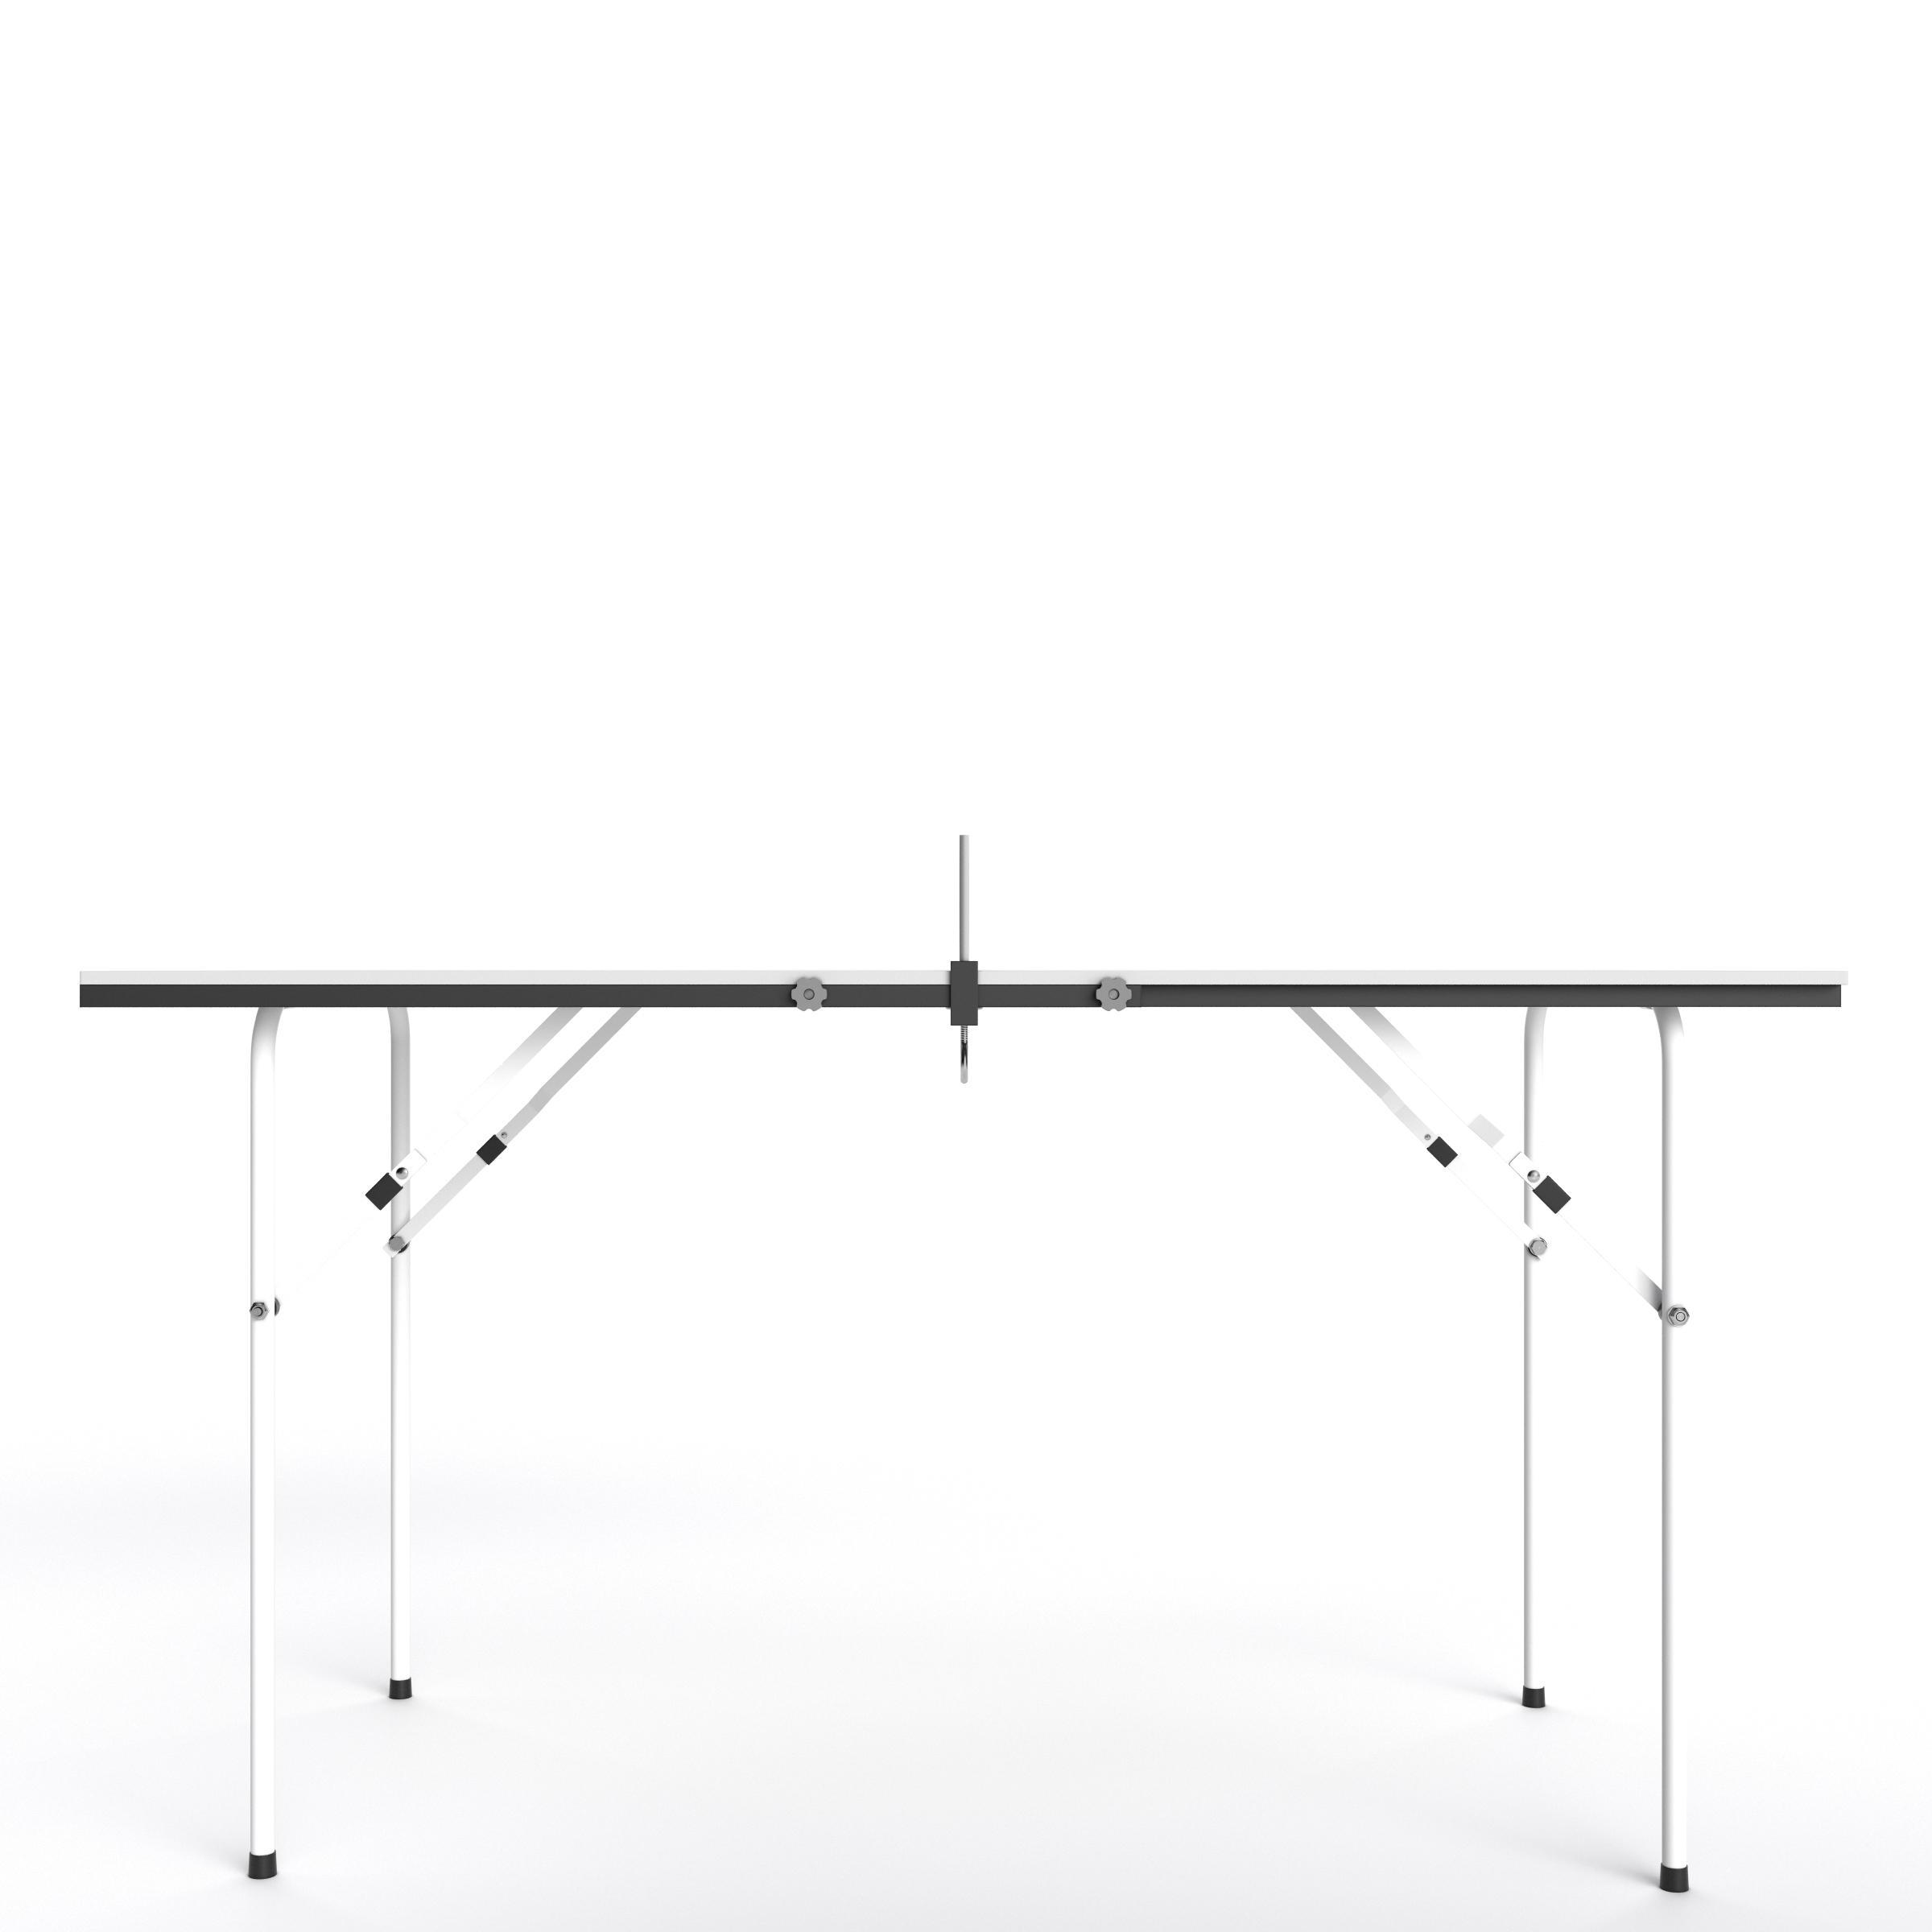 TABLE DE TENNIS DE TABLE FREE PPT 500 SMALL INDOOR